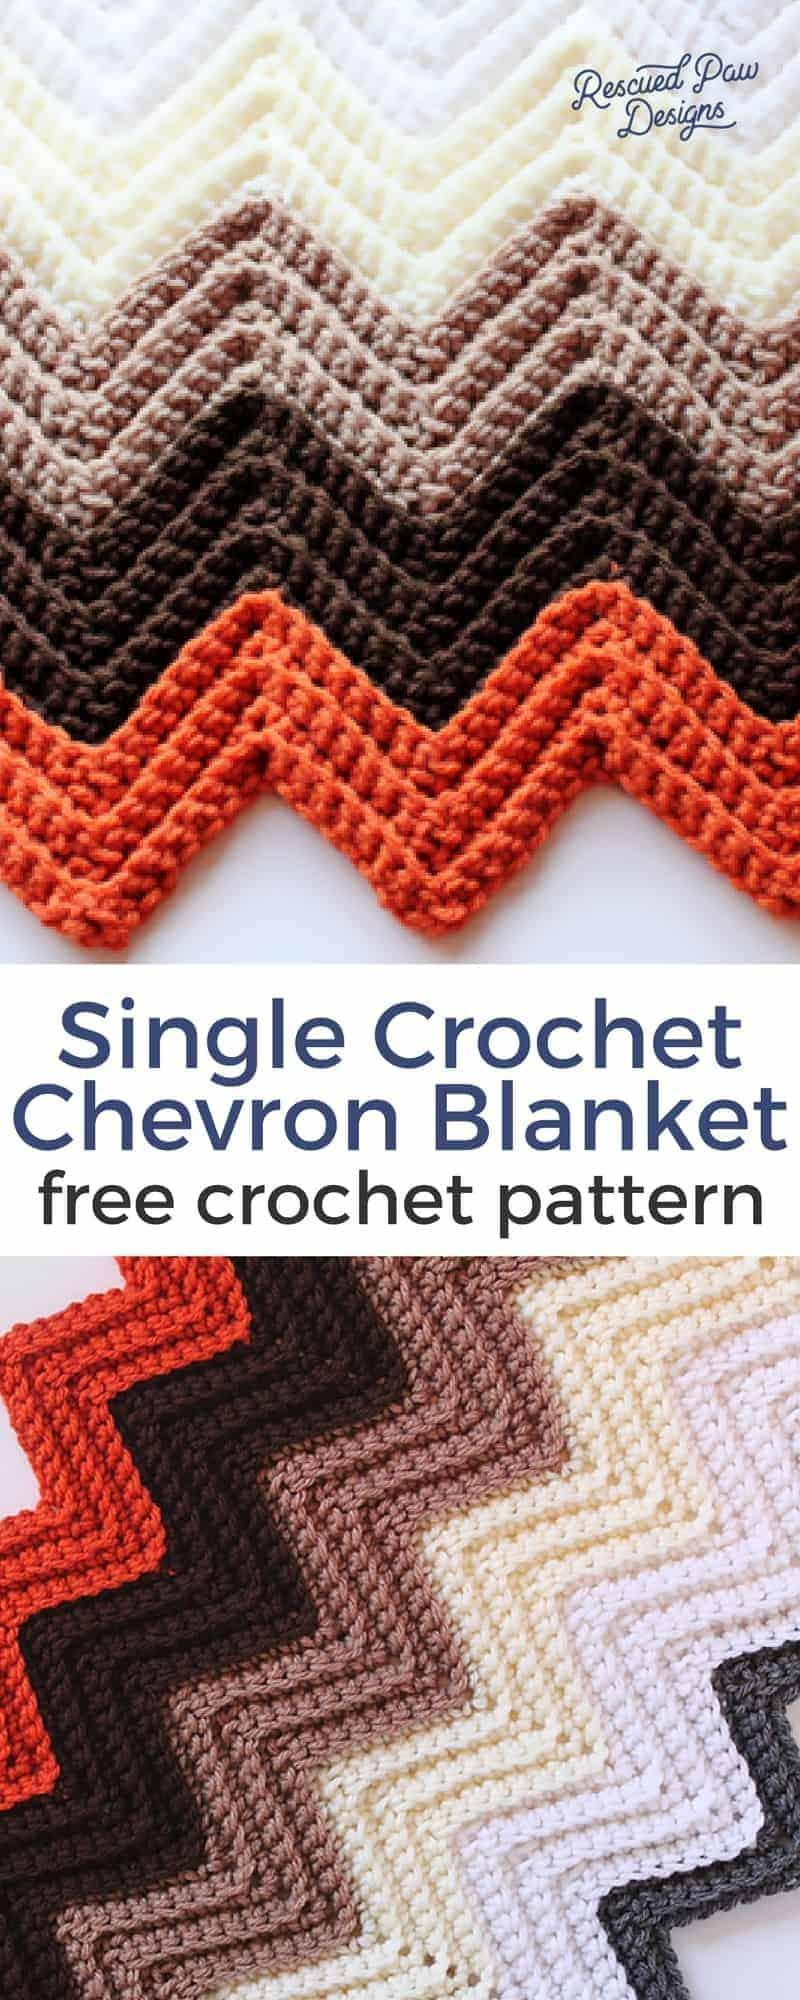 Single crochet chevron blanket rescued paw designs crochet single crochet chevron blanket pattern bankloansurffo Images